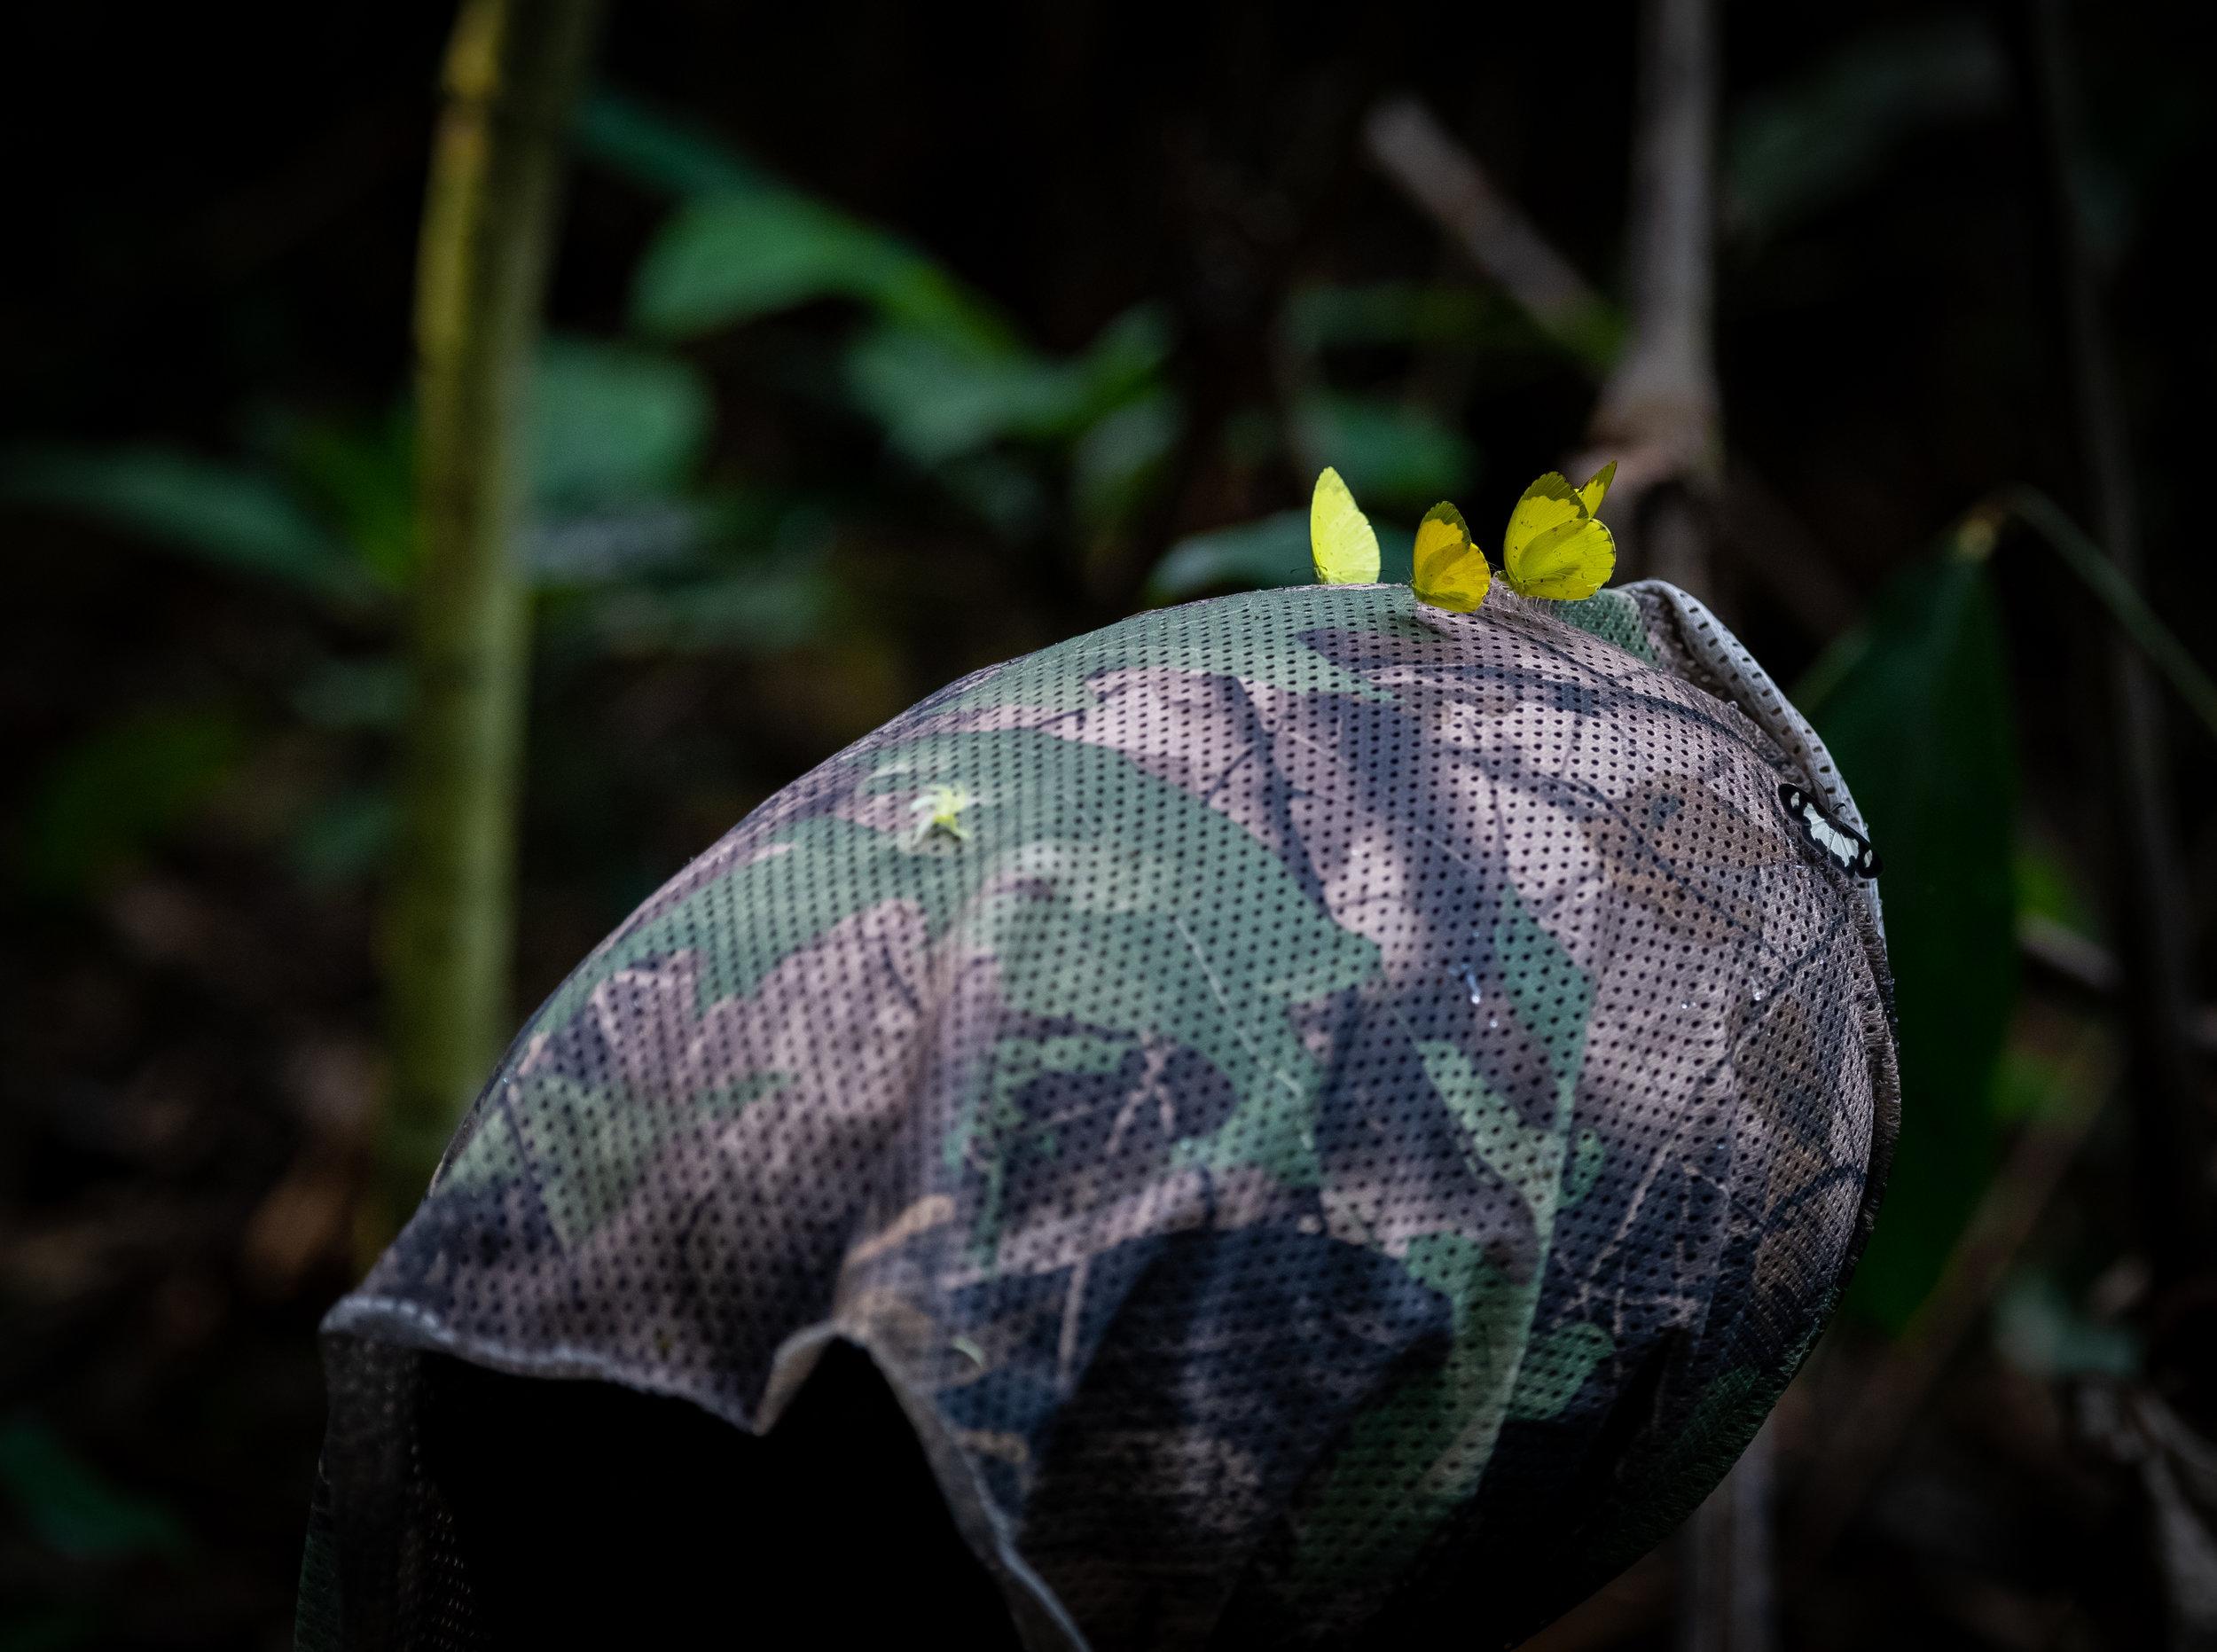 Field recording in the Congo rainforest